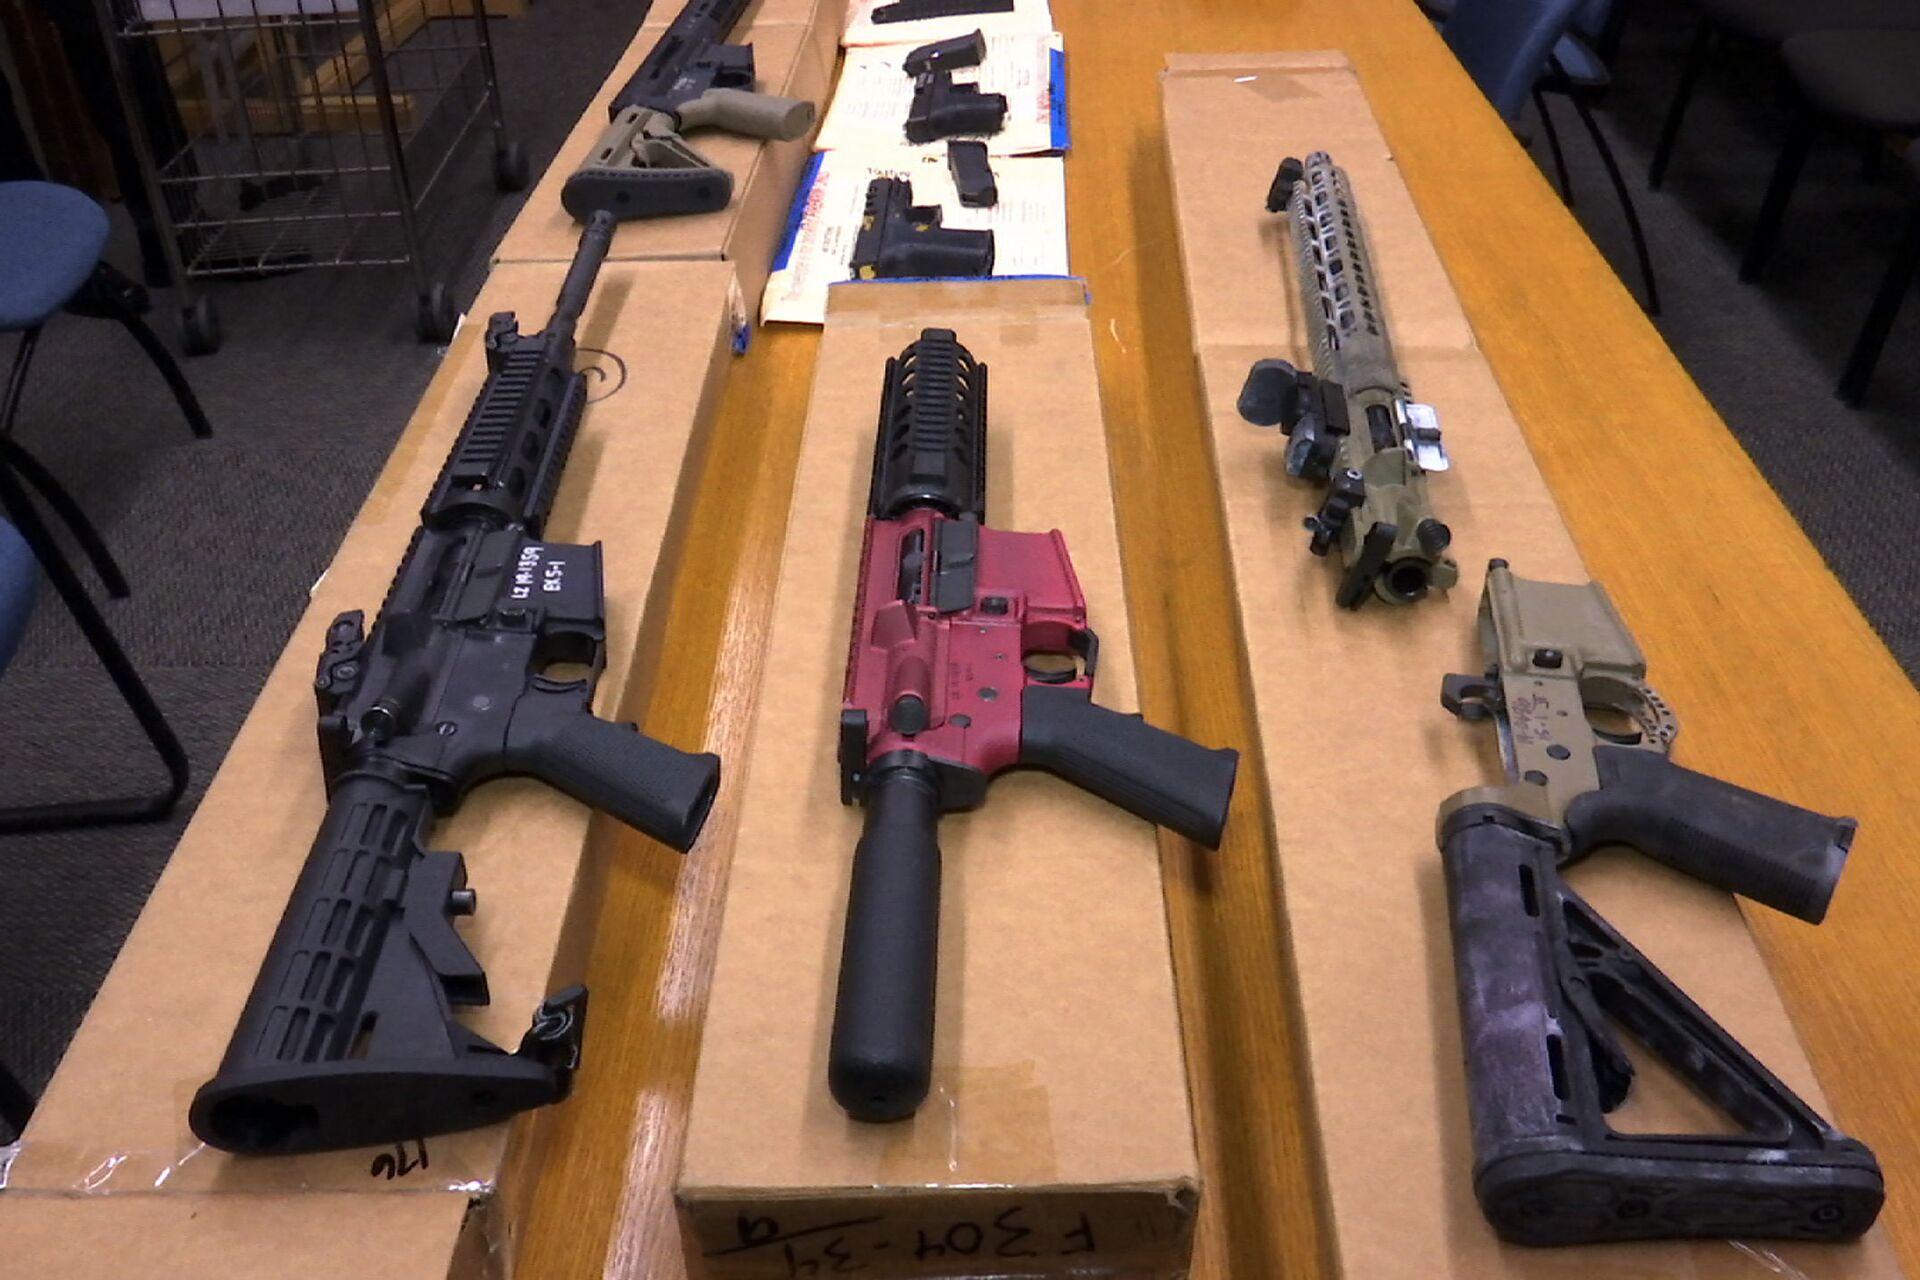 Biden Calls for Ending Legal Immunity for Gun Manufacturers - Sputnik International, 1920, 08.04.2021